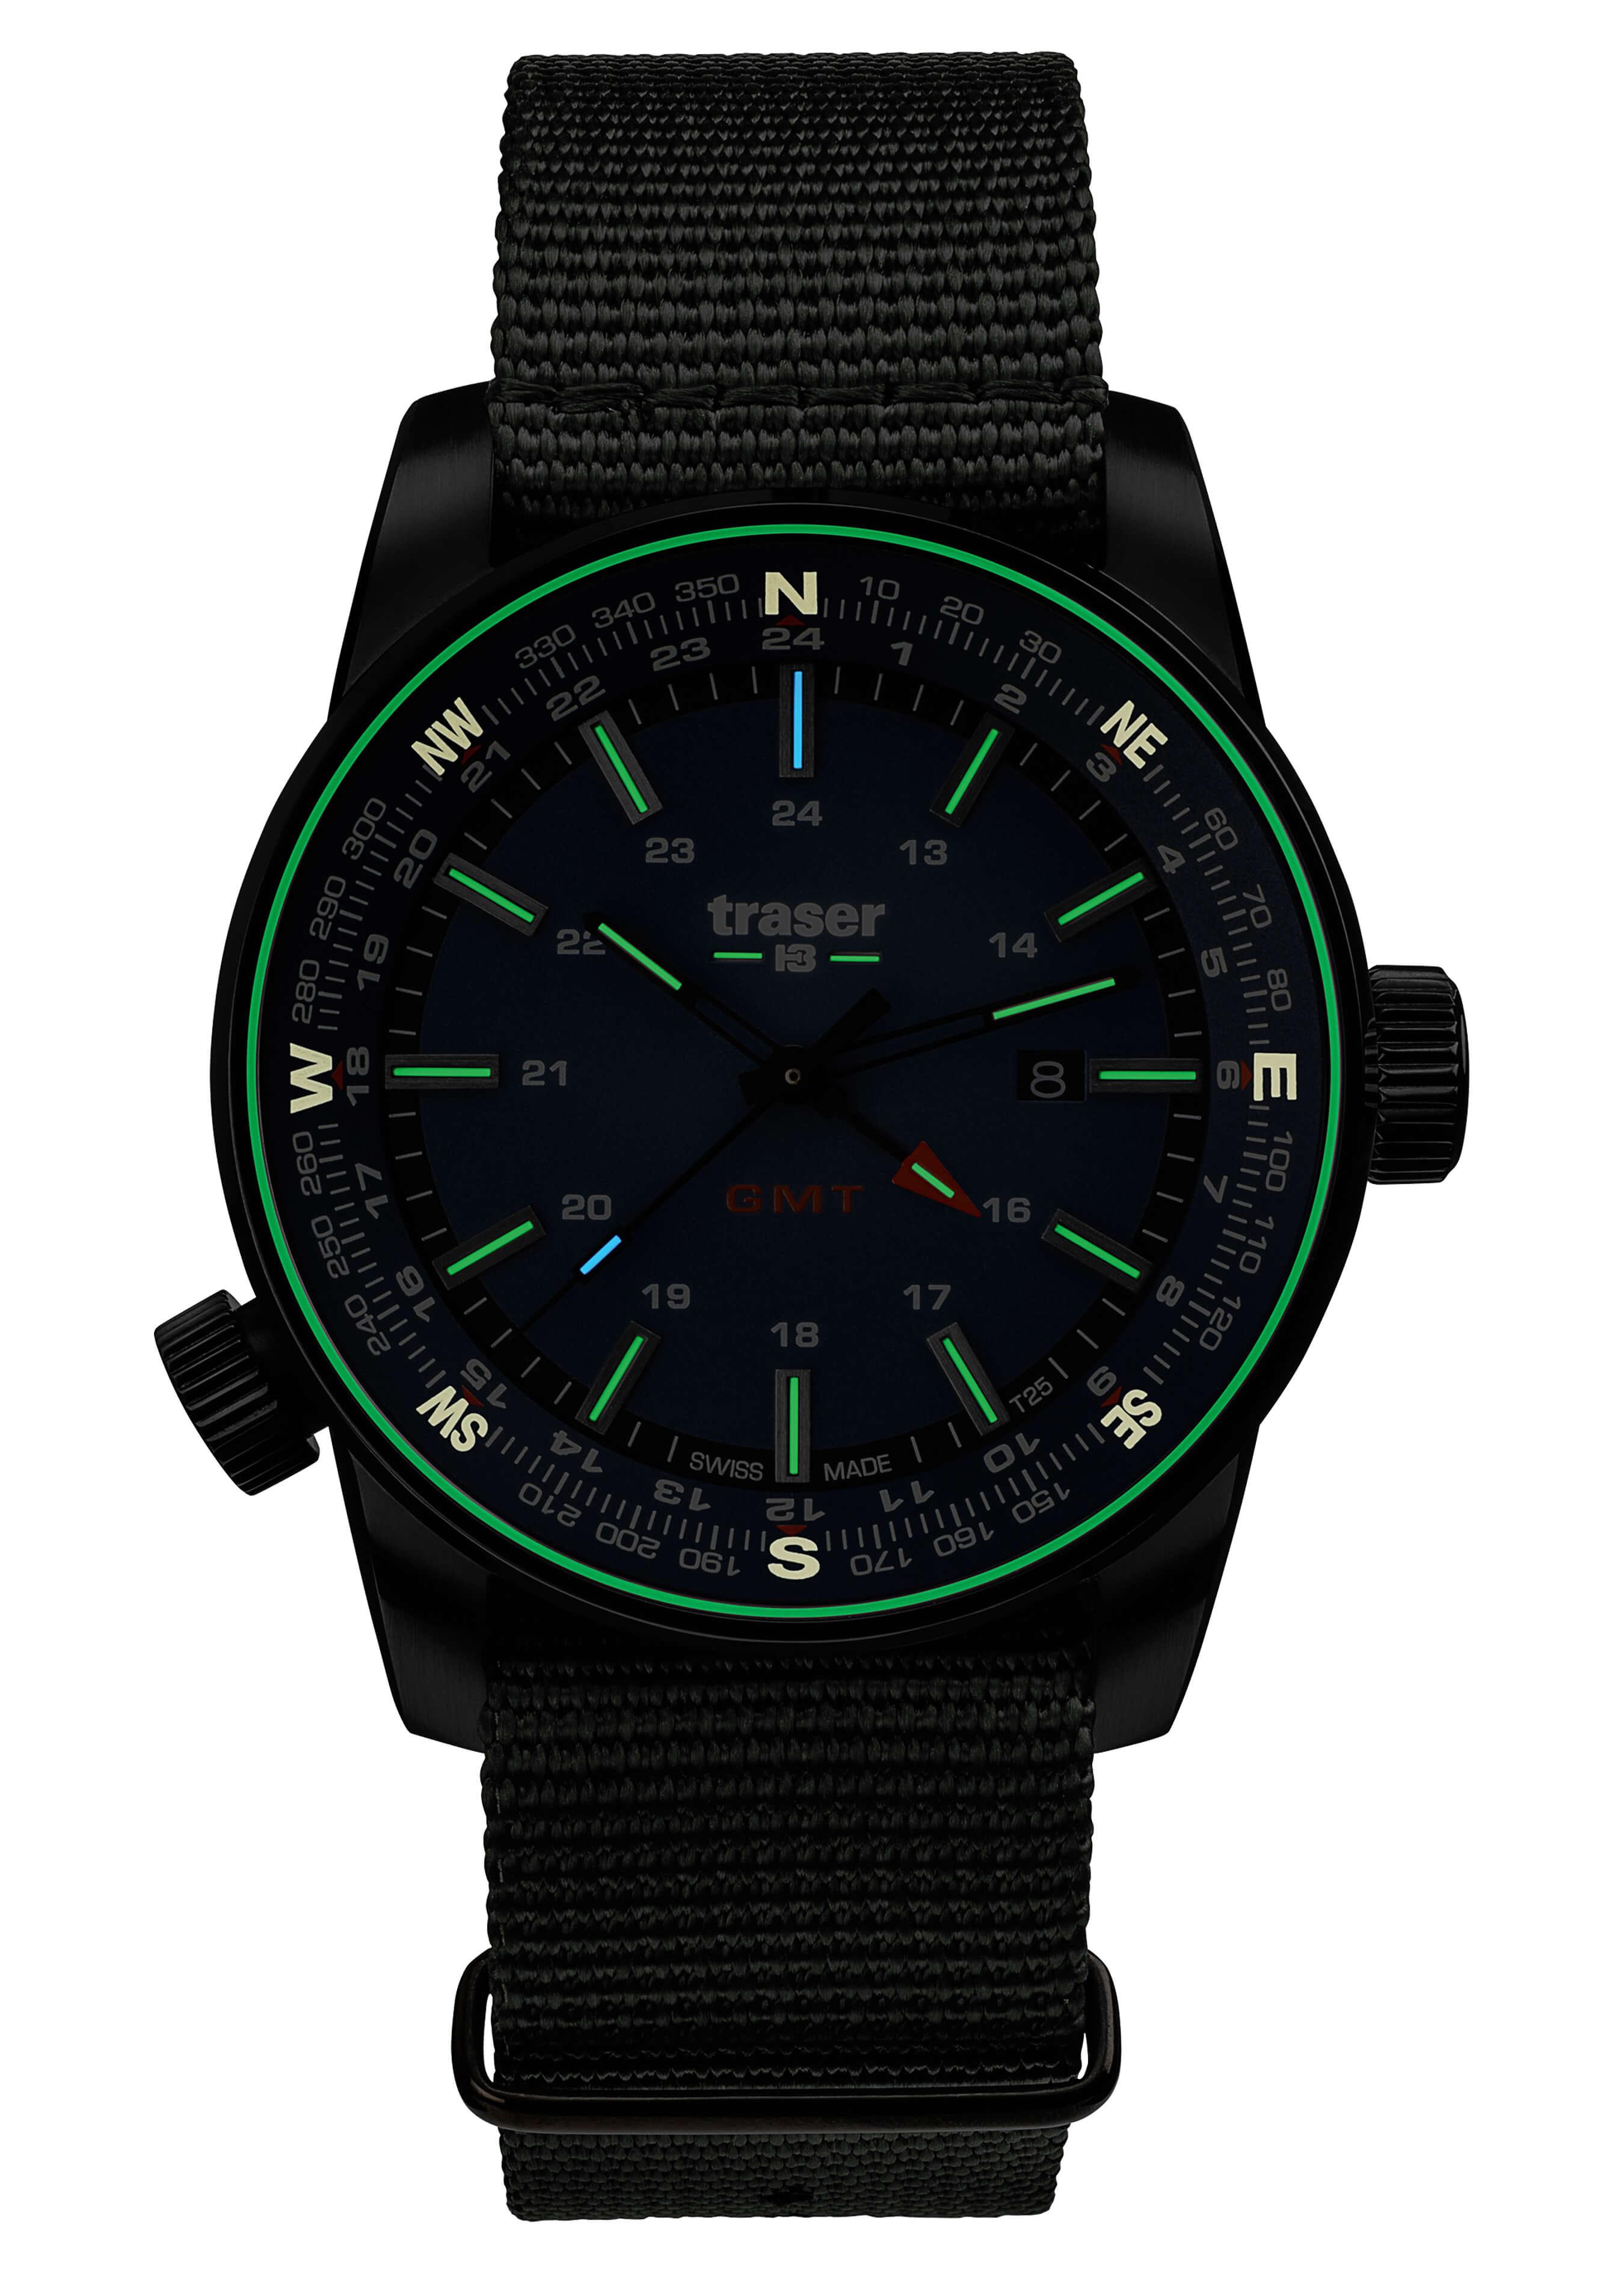 Montre bracelet P68 Pathfinder 262626 2